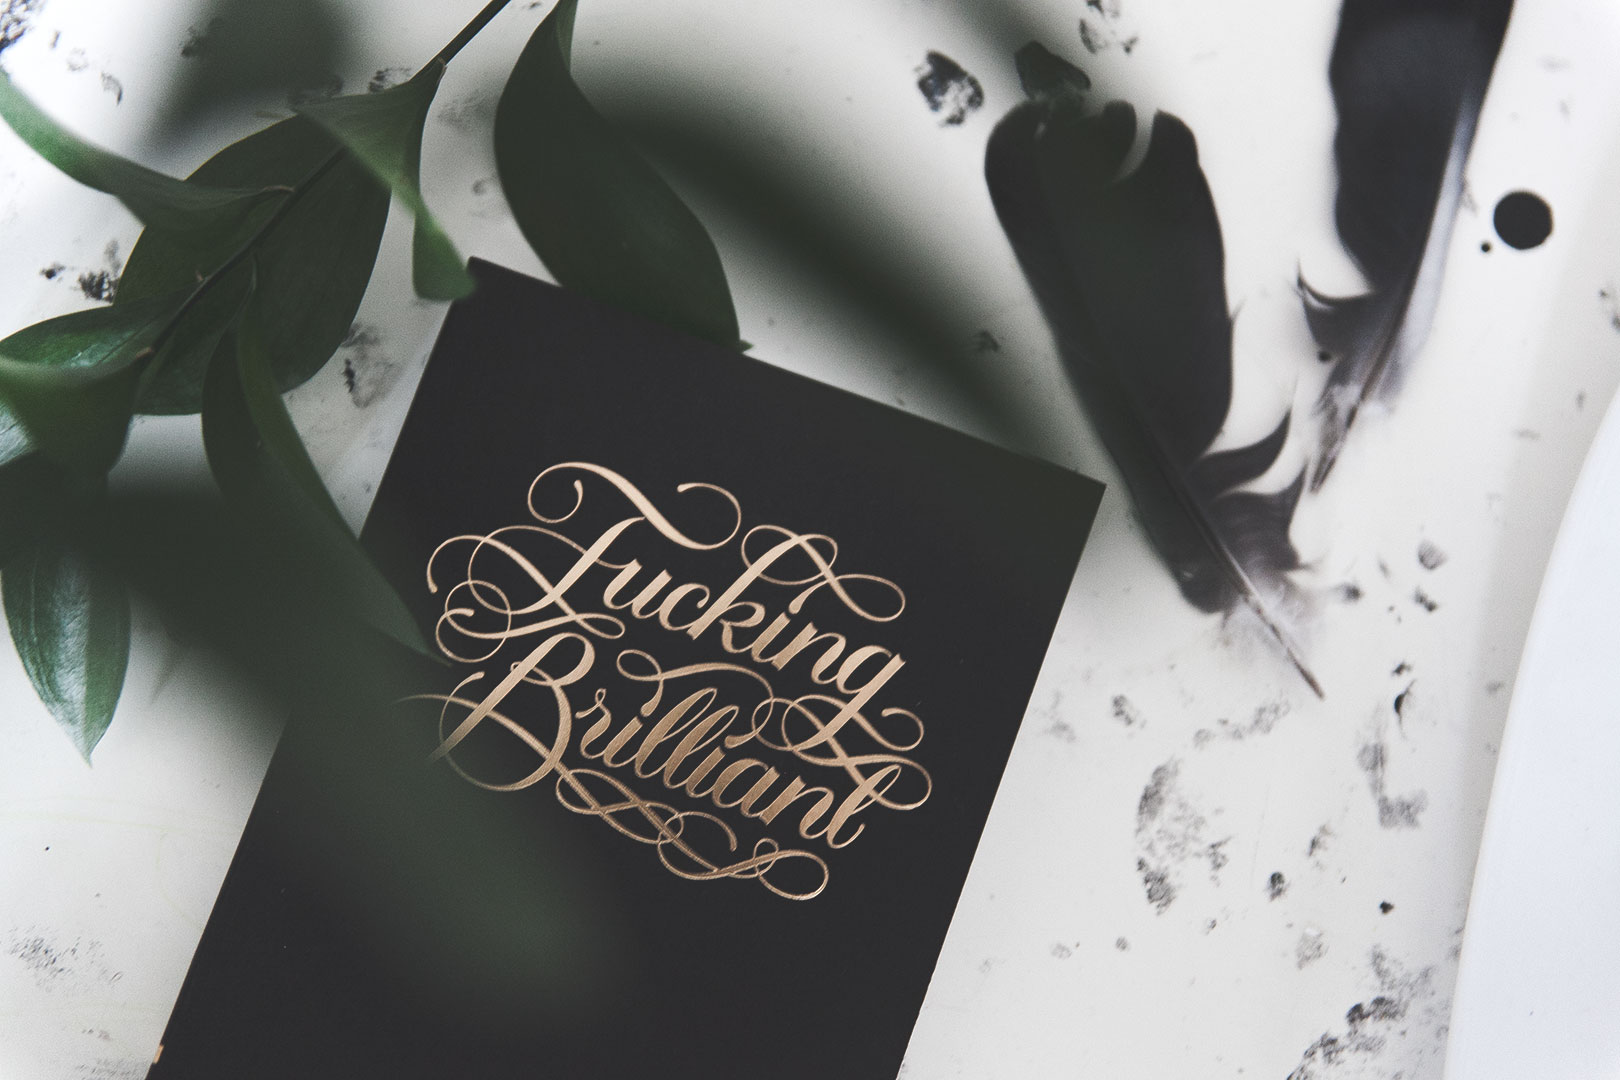 fuckingbrilliant